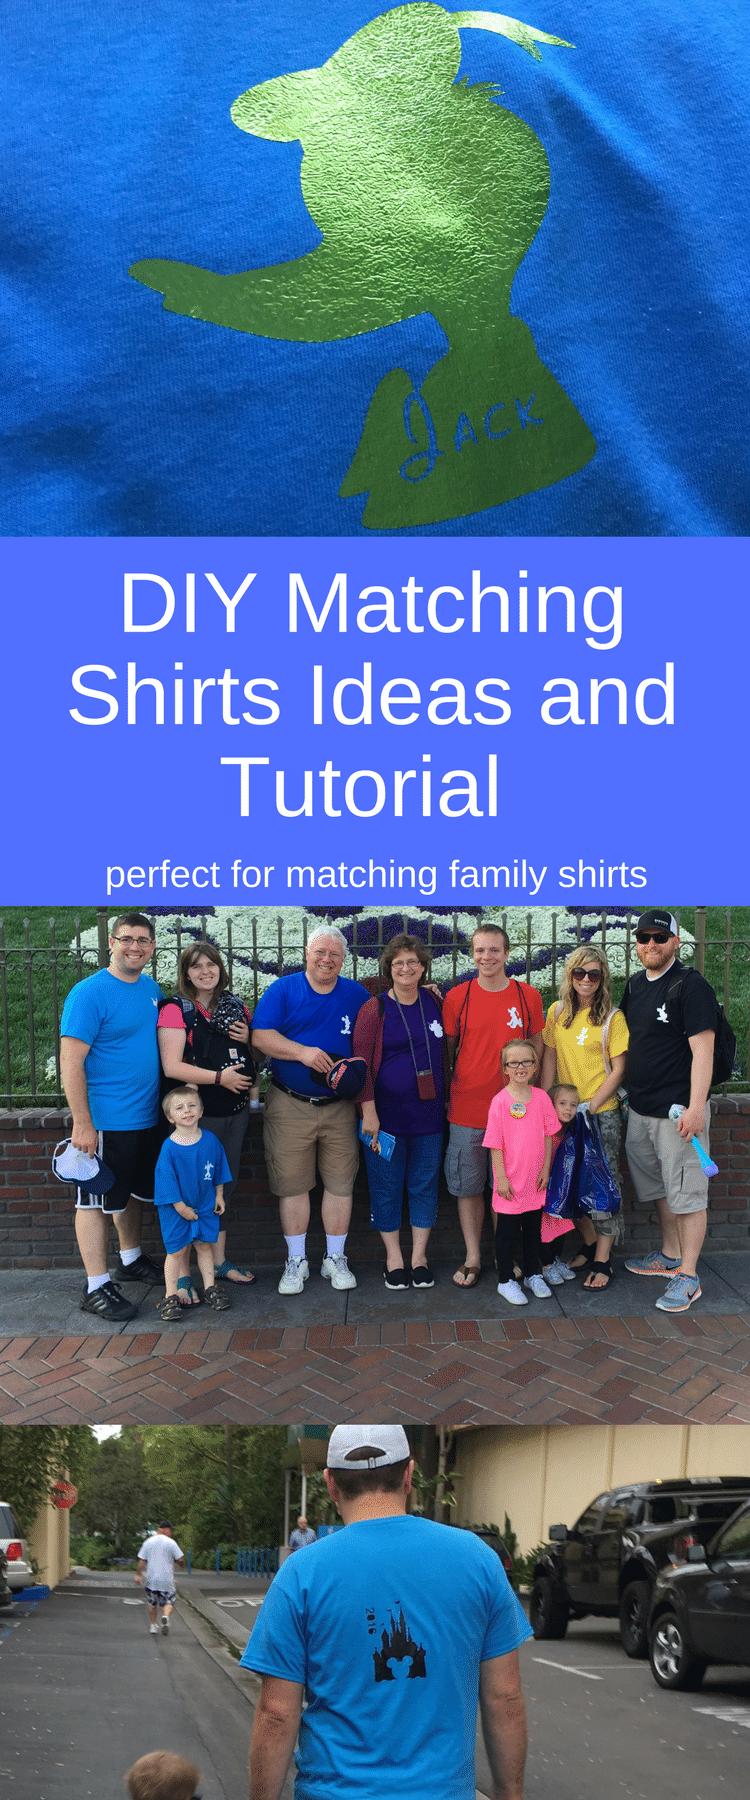 DIY Matching Disneyland Shirt Ideas / Matching Disneyland T-Shirts / Family Disneyland T-shirts / Disneyland Shirts / DIY Disney SHirts via @clarkscondensed